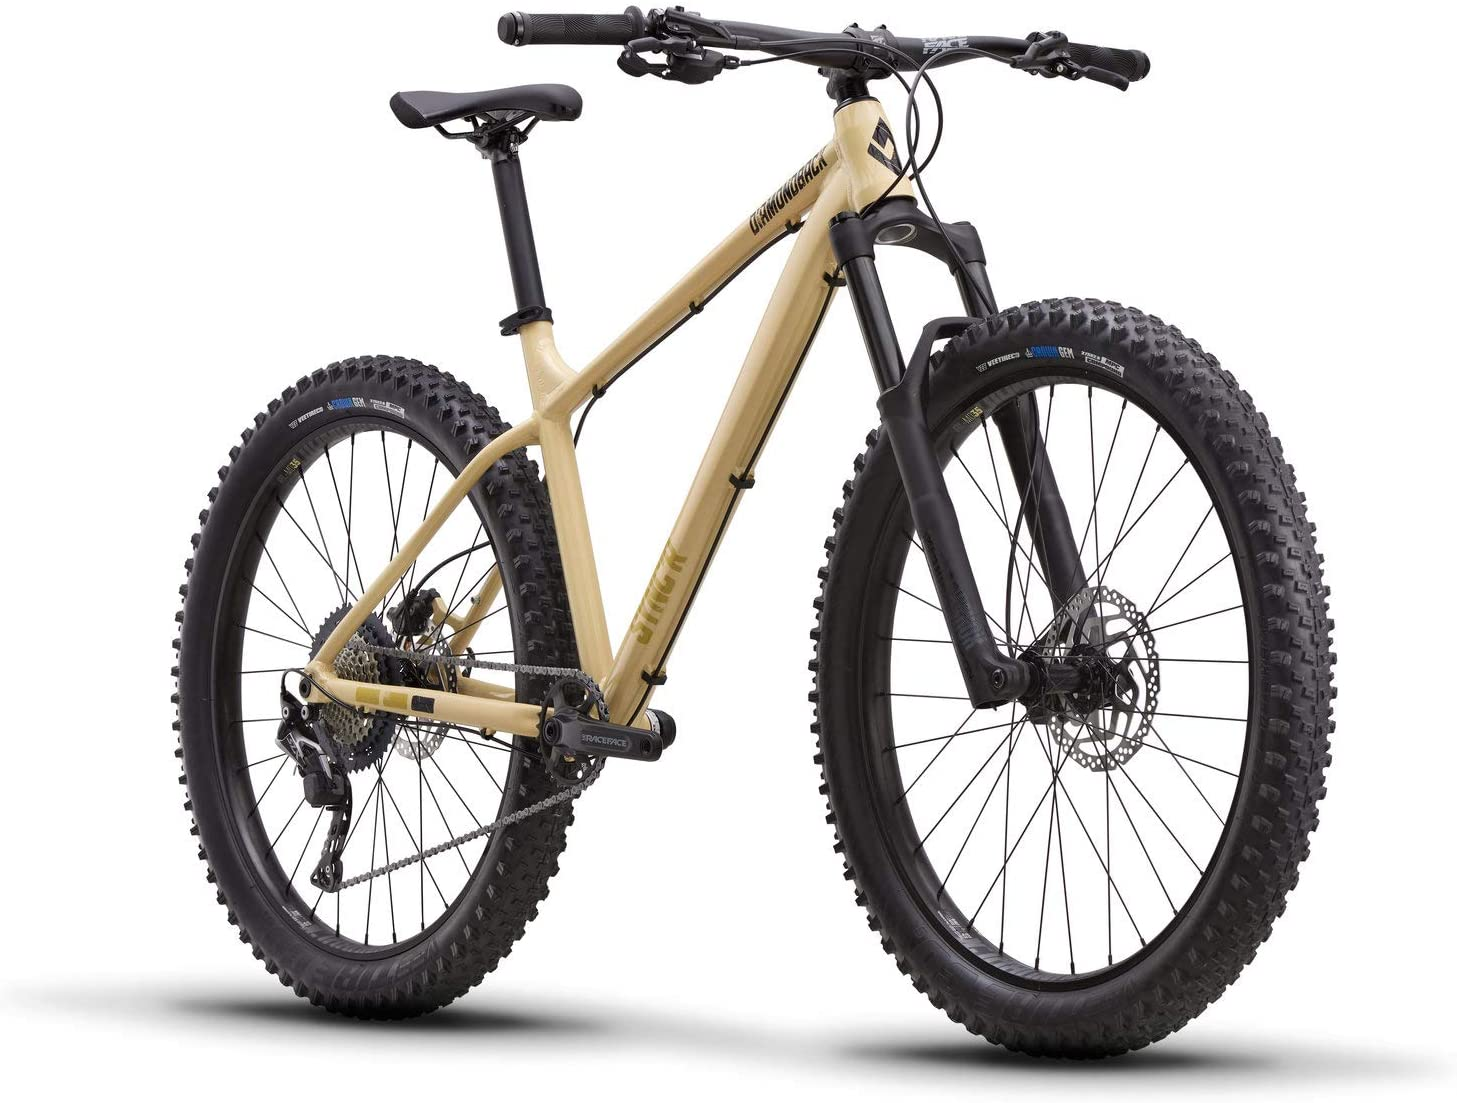 Diamondback Sync'r 27.5 Hardtail Mountain Bike}